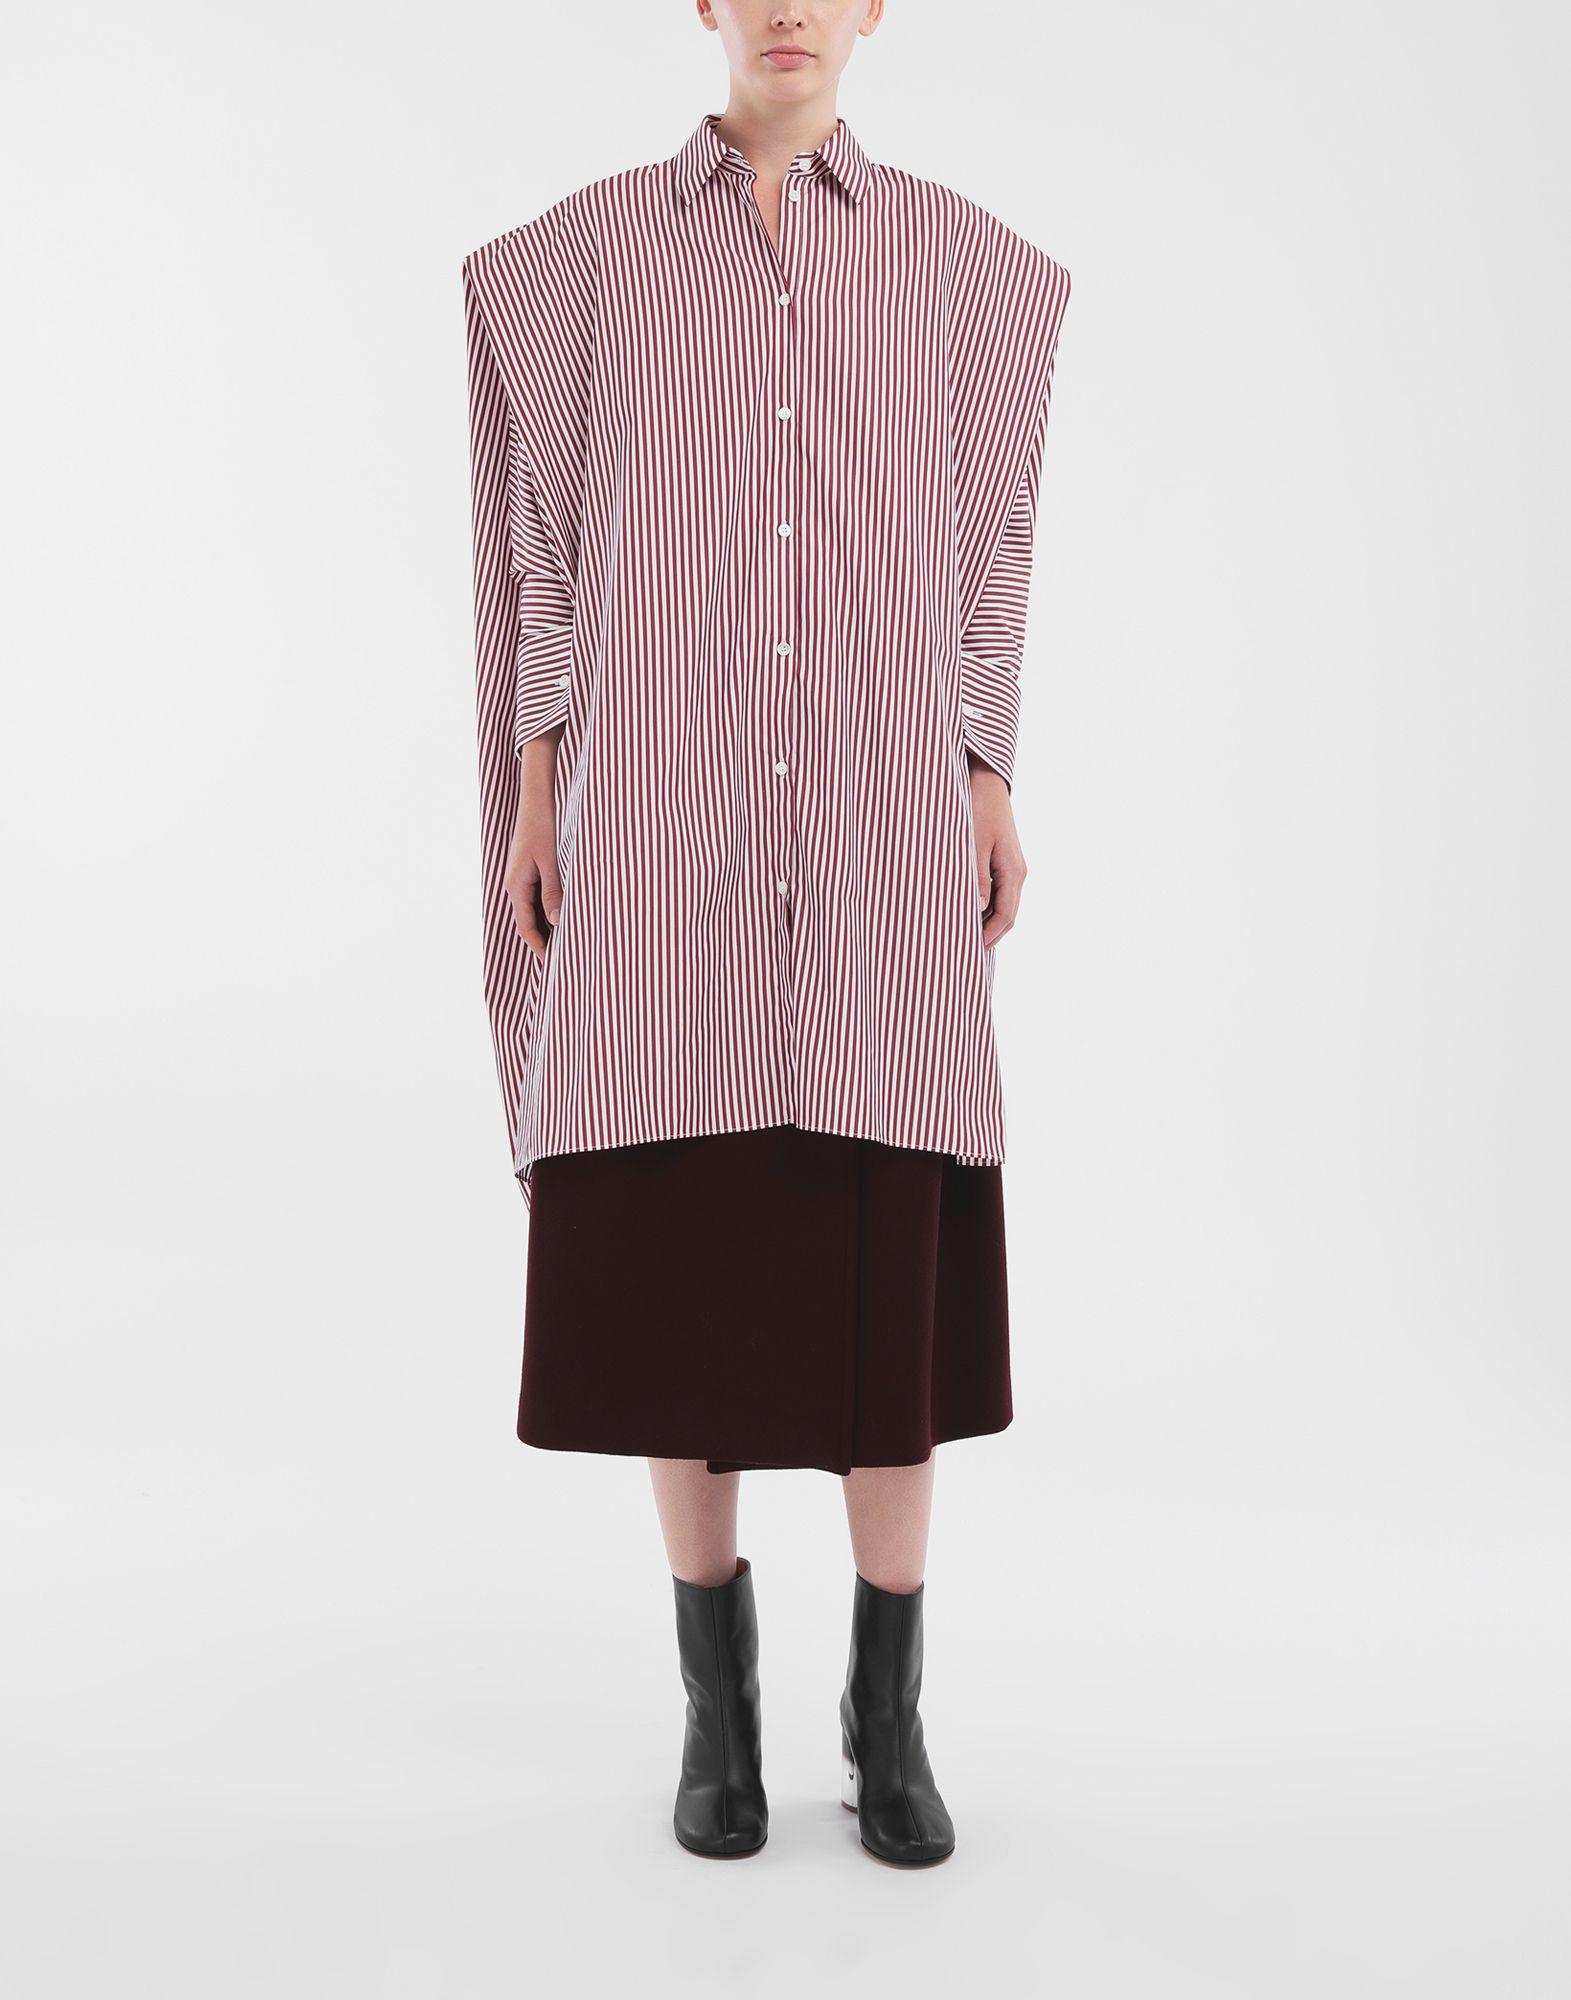 MAISON MARGIELA Camisa con dobladillo asimétrico y raya diplomática Minivestido Mujer d